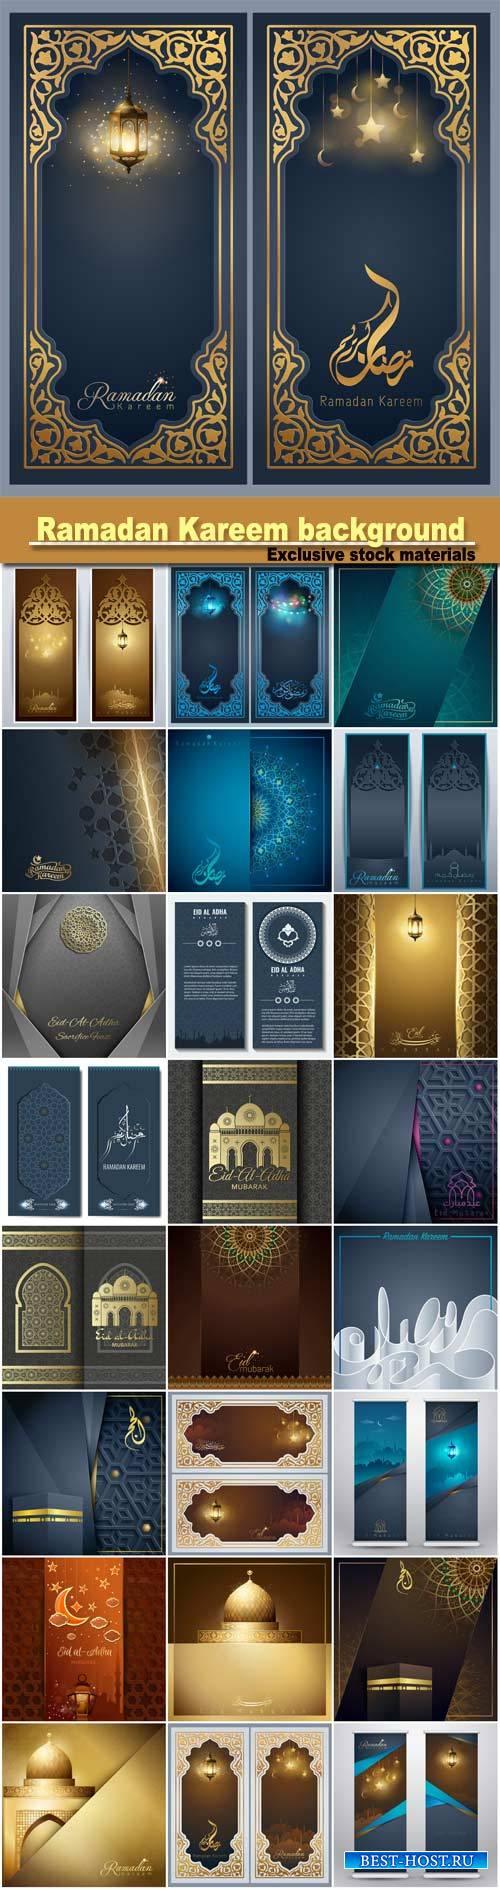 Ramadan Kareem greeting banner background template for islamic festival des ...